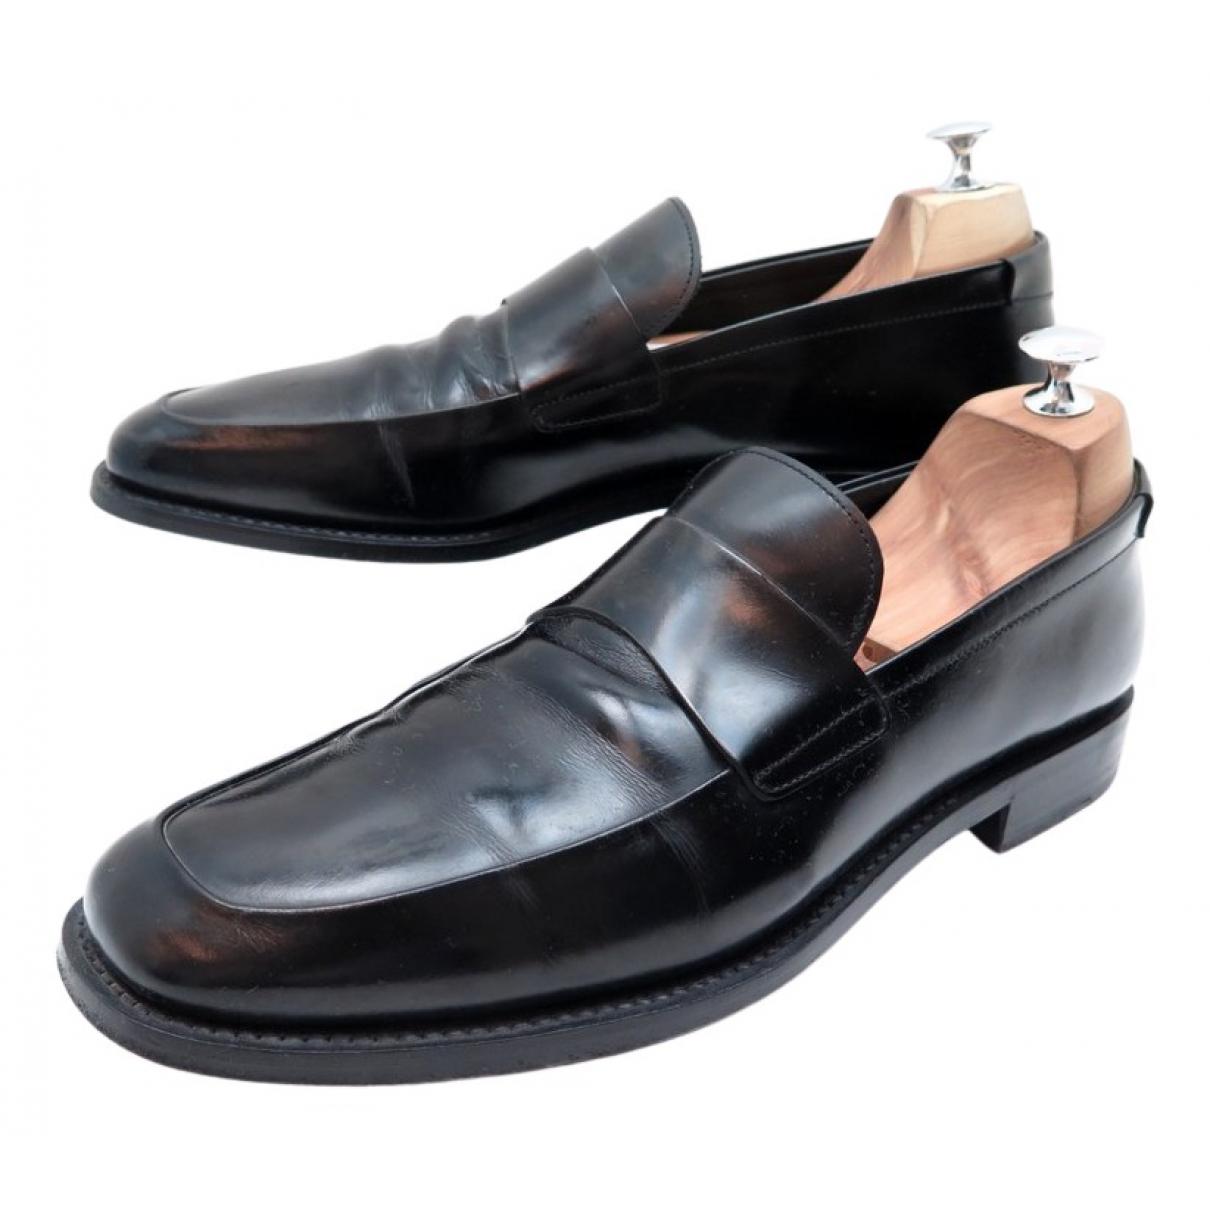 Prada N Black Leather Flats for Women 43 EU